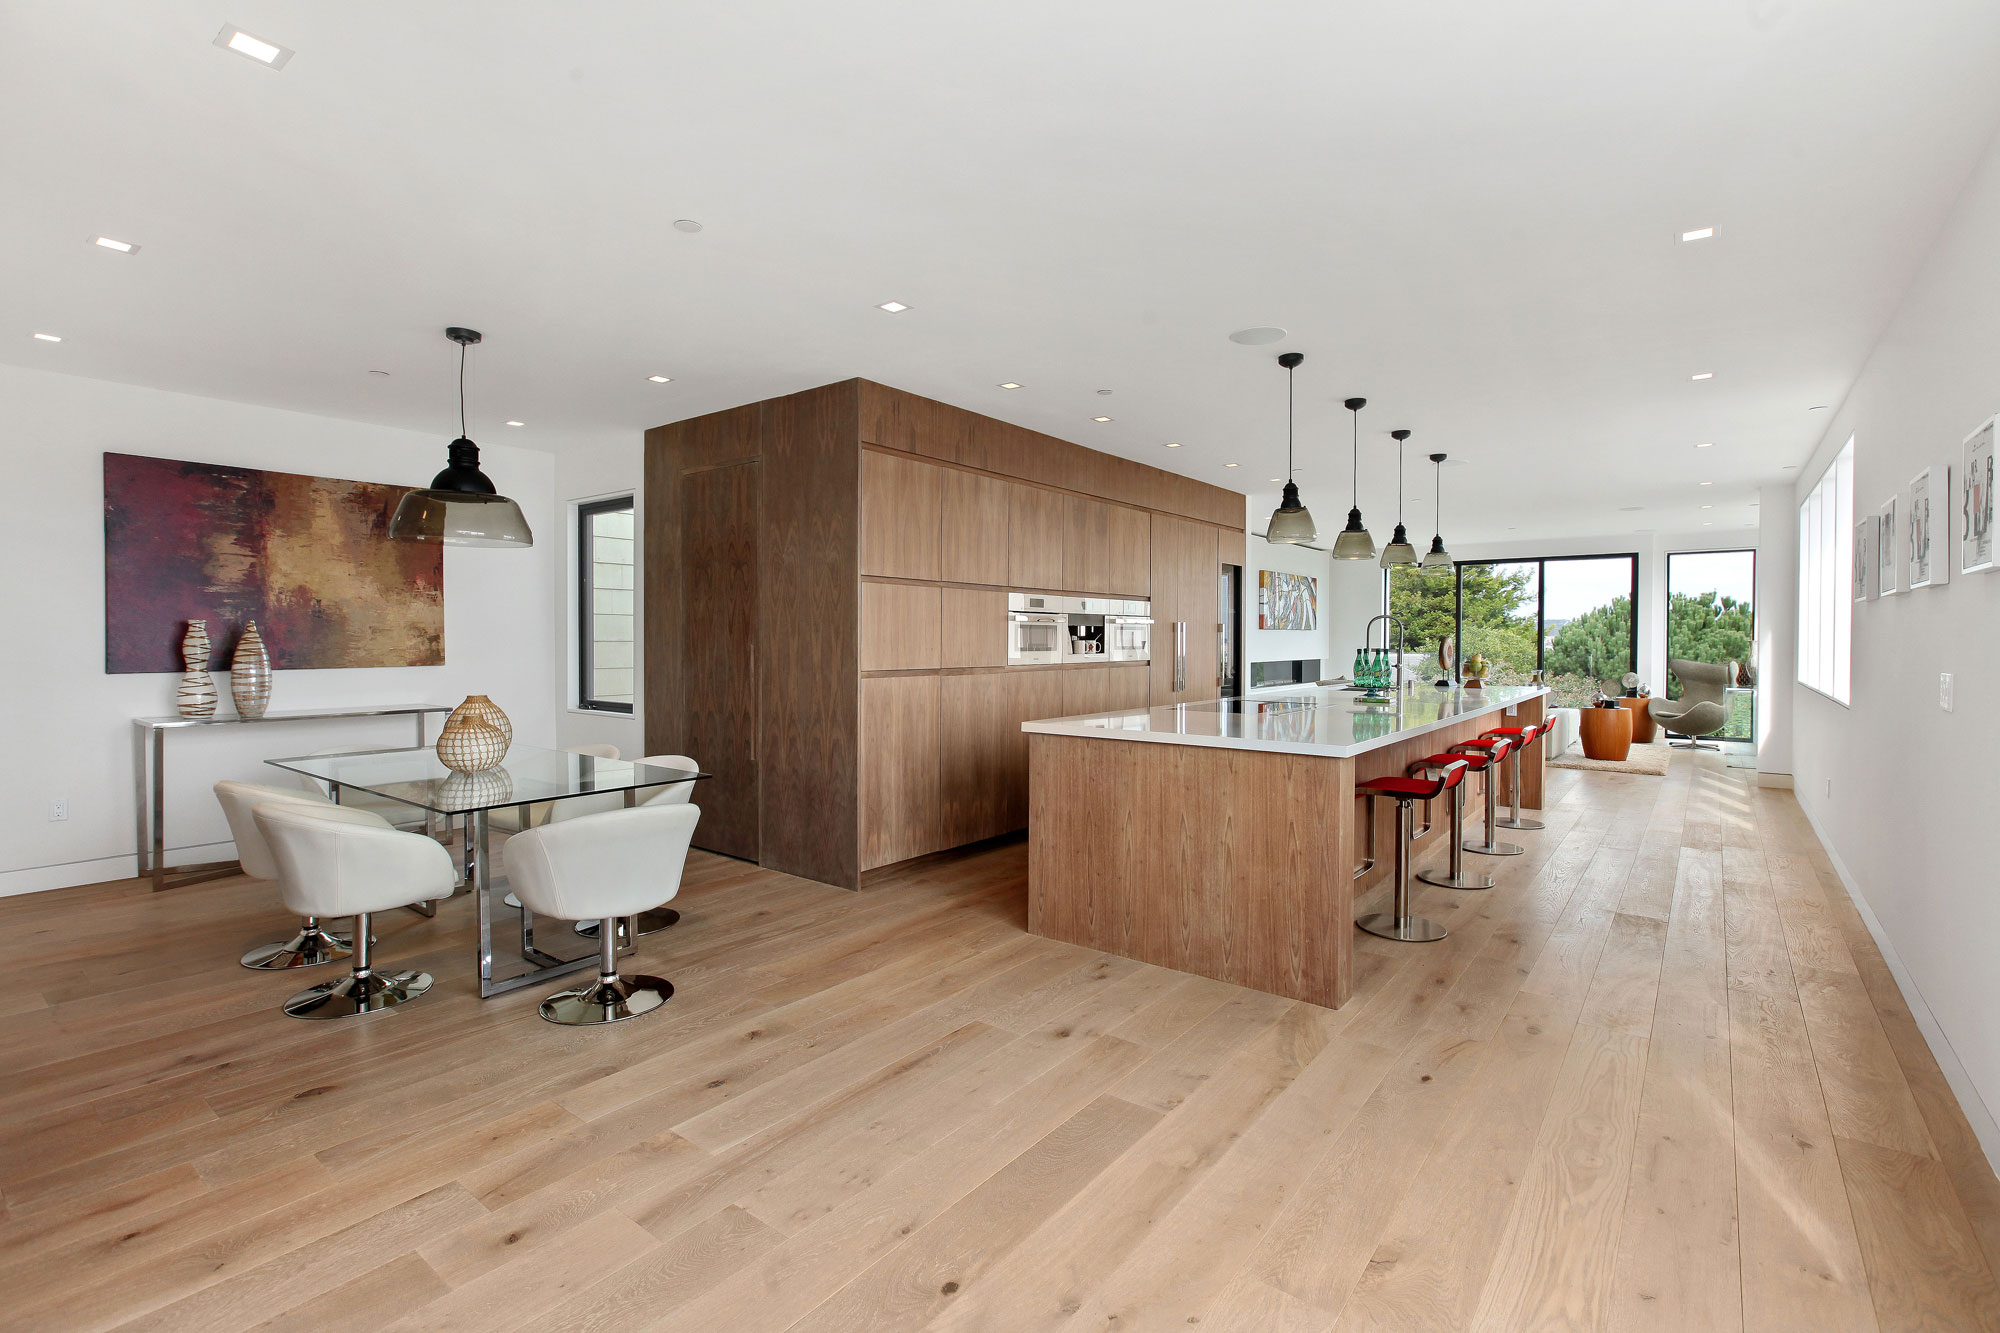 Sleek Modern Home with Views Over the San Francisco Skyline